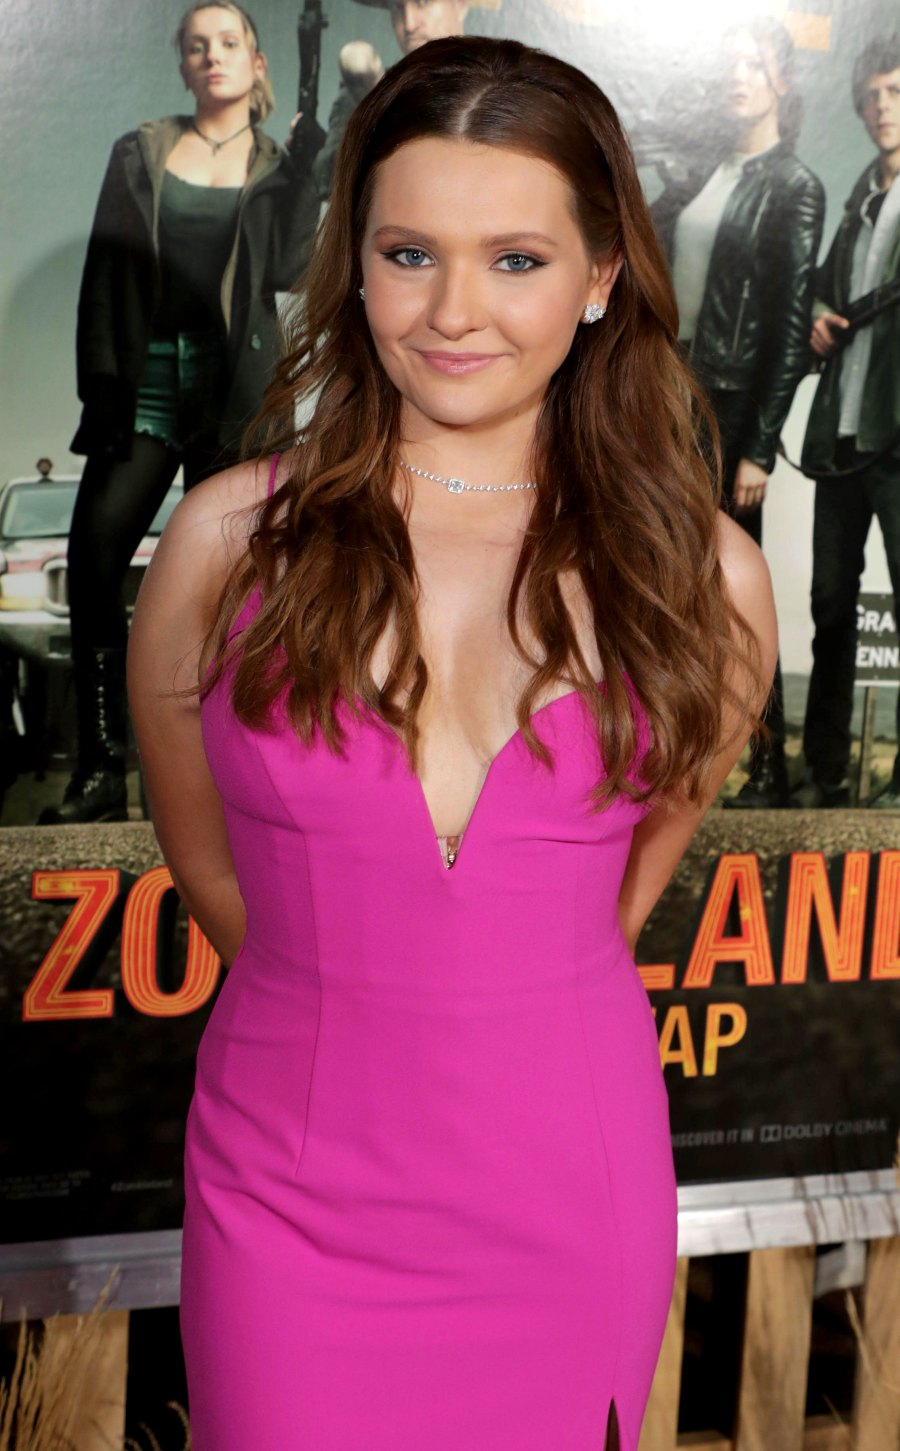 Abigail Breslin Abigail Breslin More Former Costars Speak Out Amid Lea Michele Drama